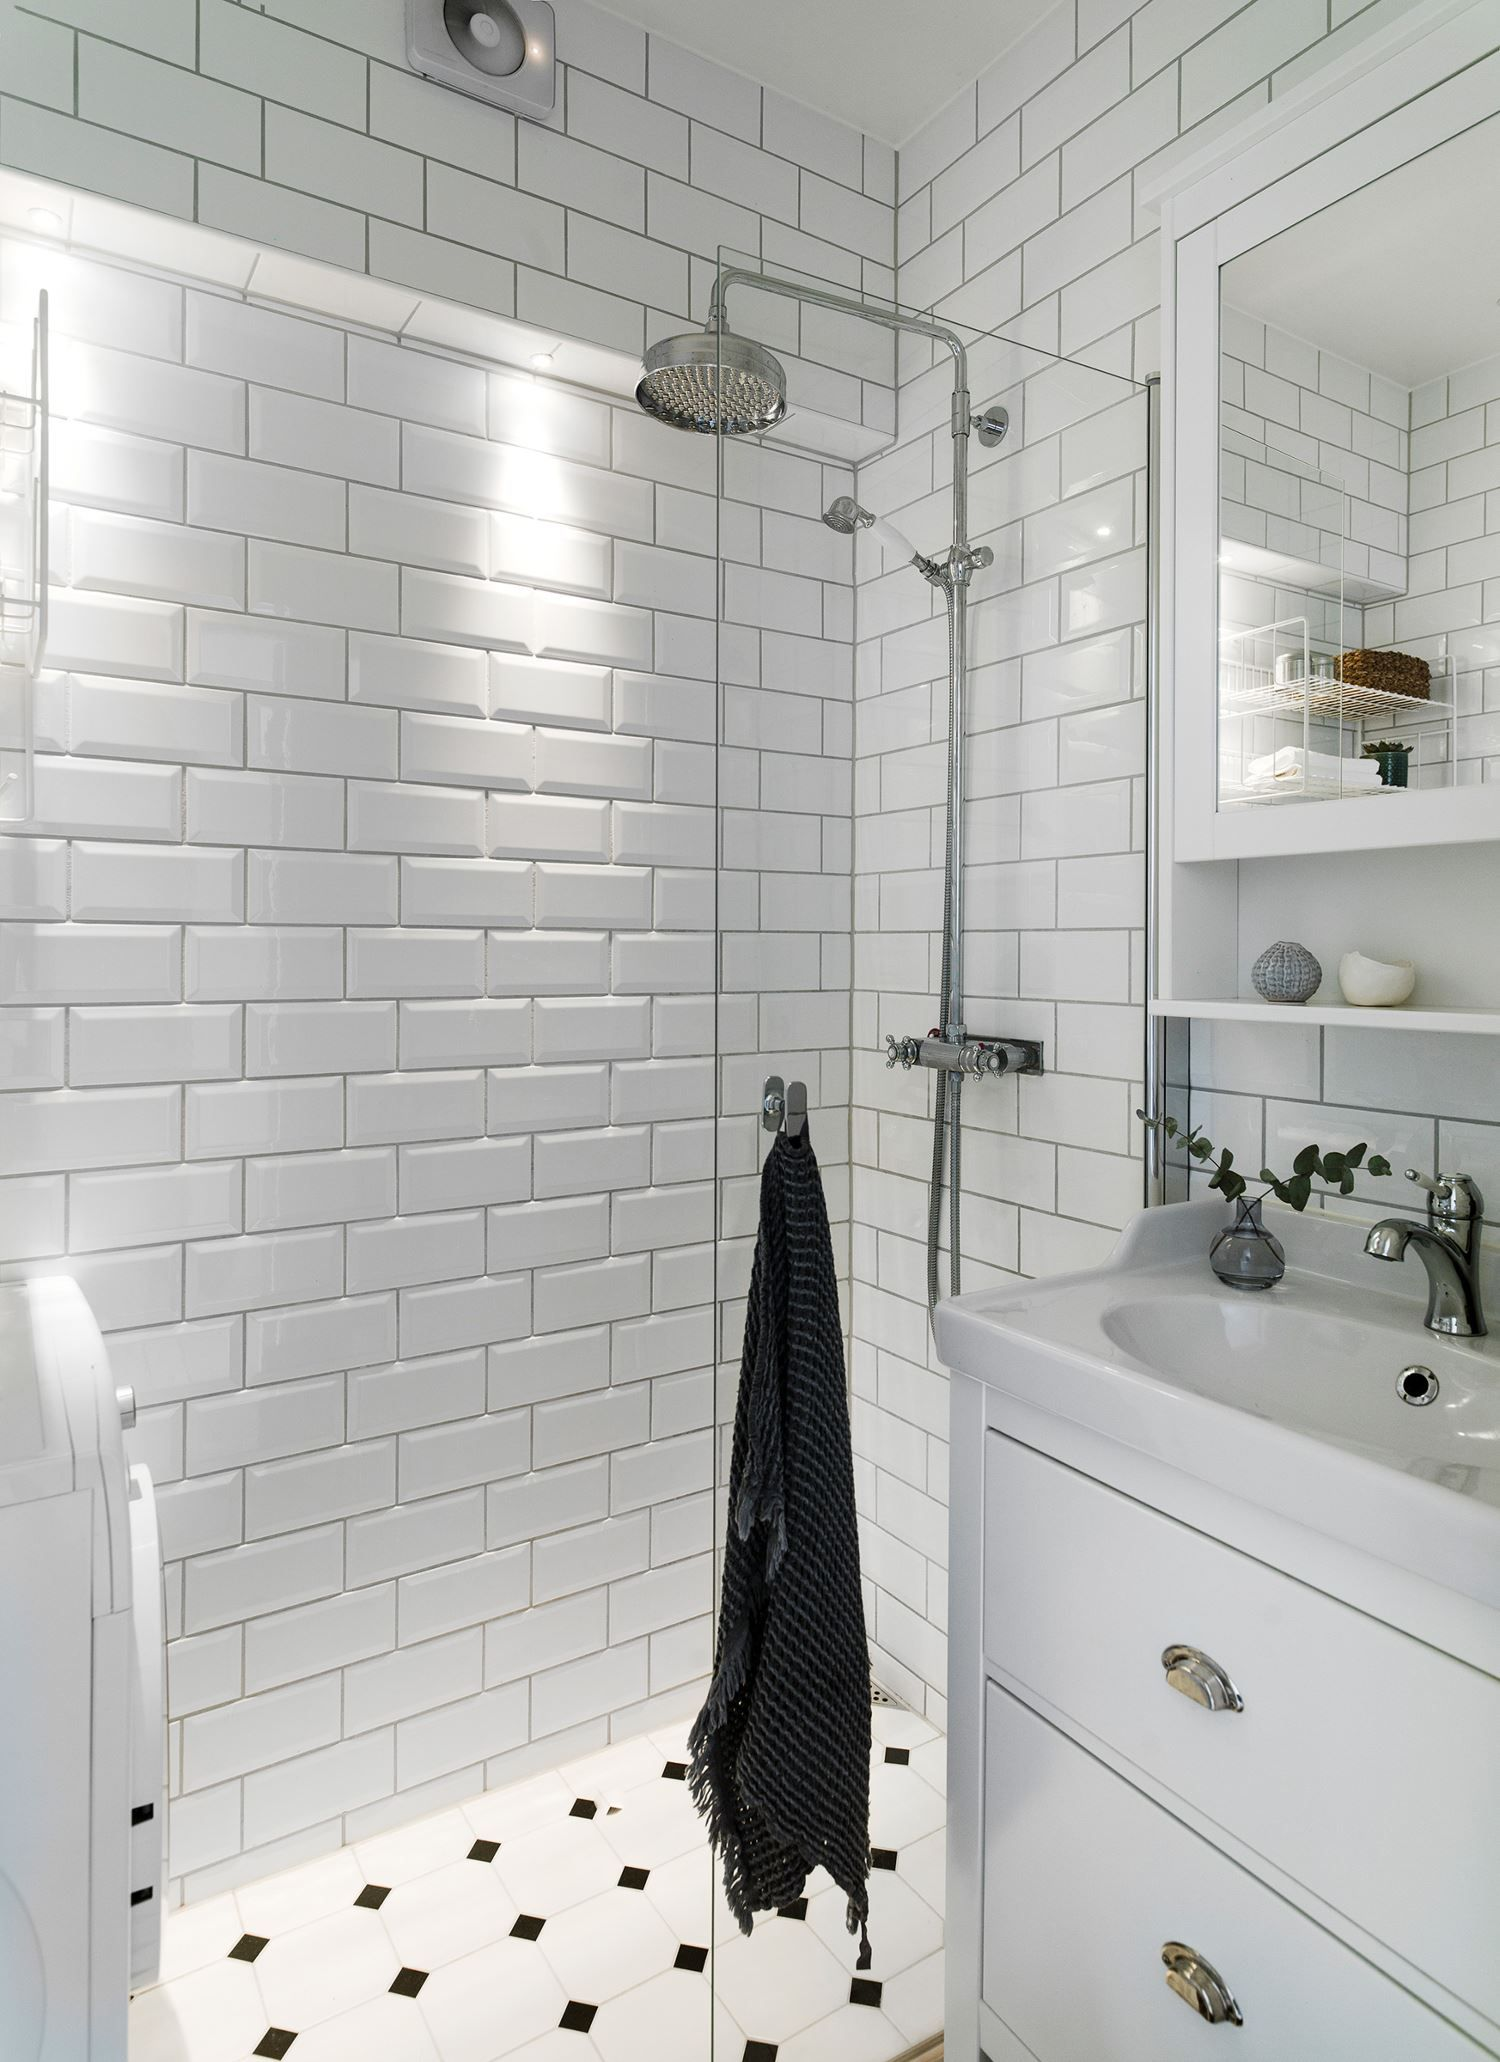 Stuga badrum idéer